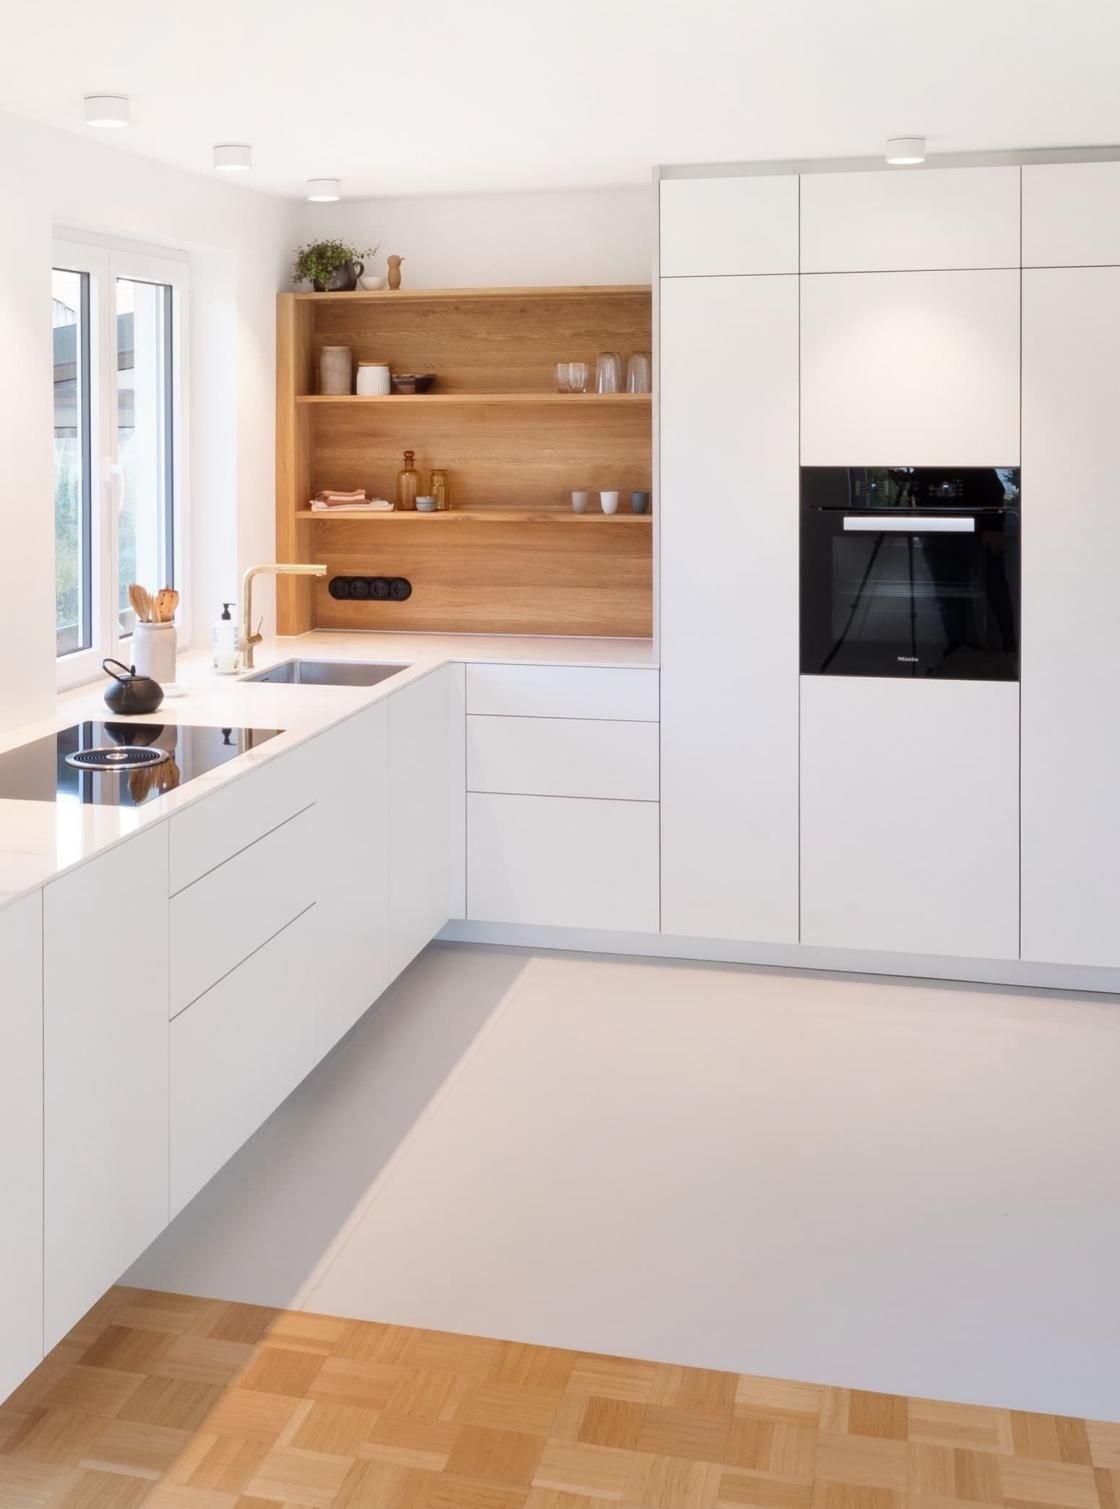 Skandinavisch und Klassisch: Gold, Marmor, Holz   NR Küchen